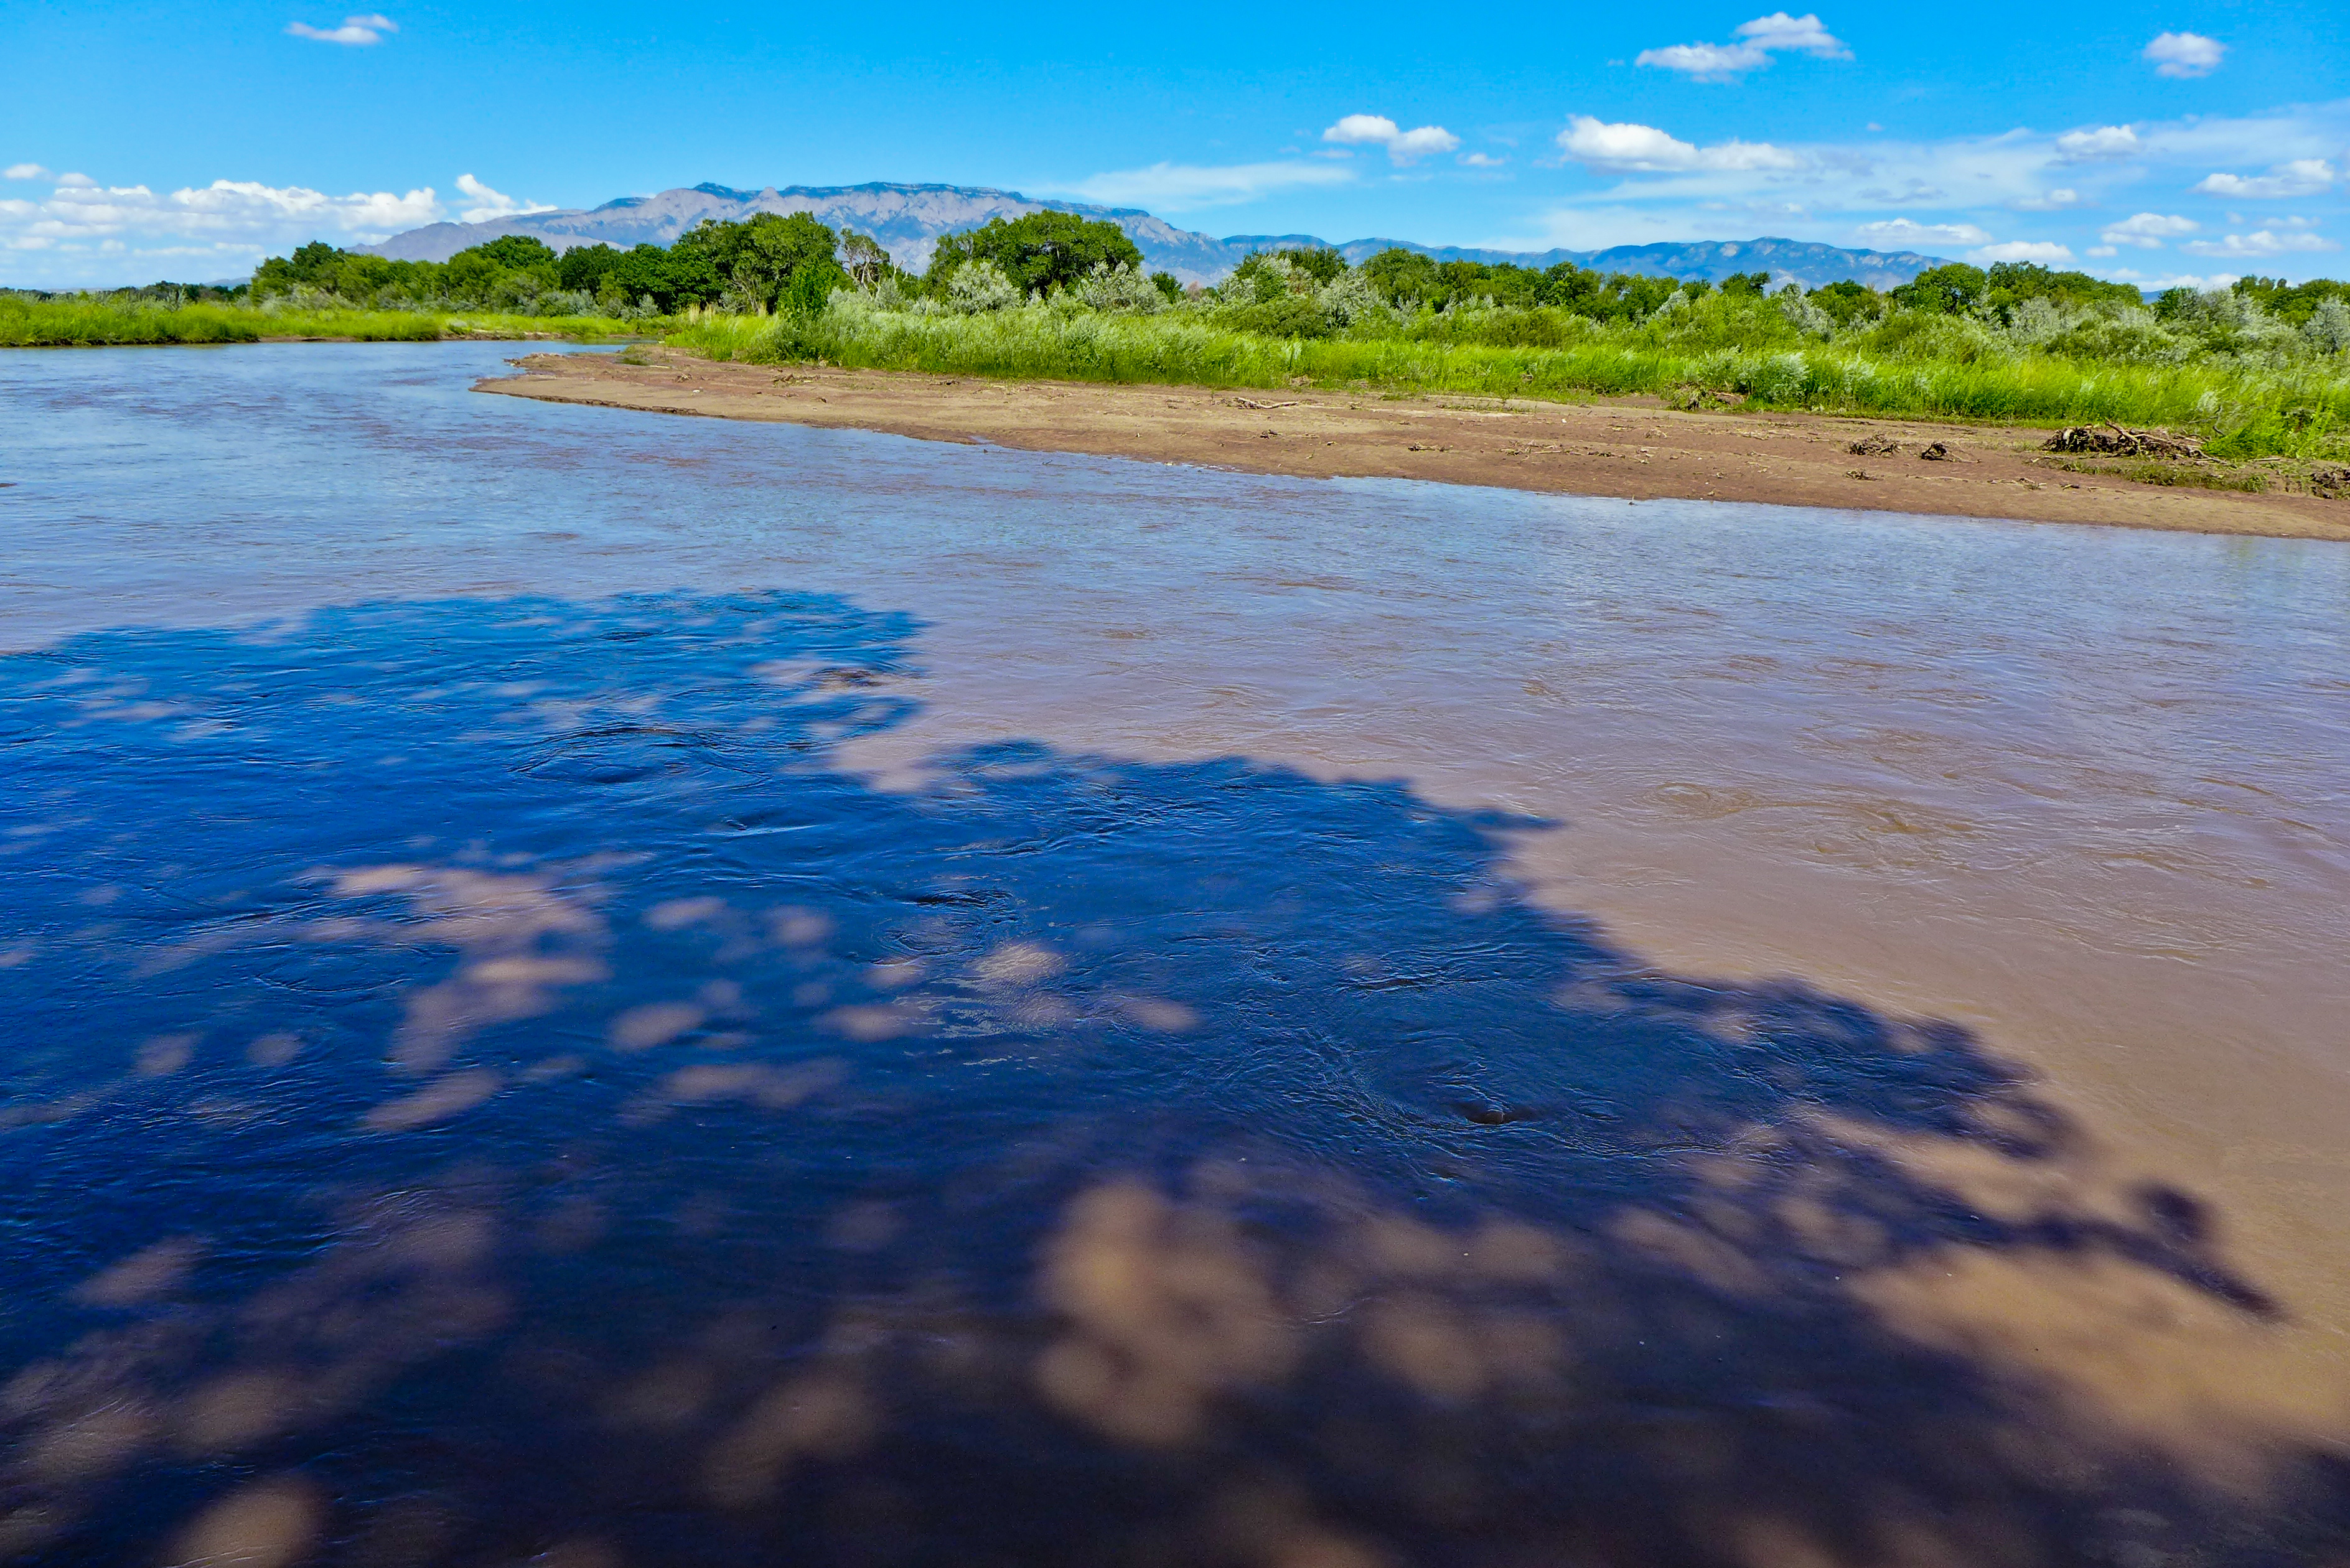 The Rio Grande in Albuquerque